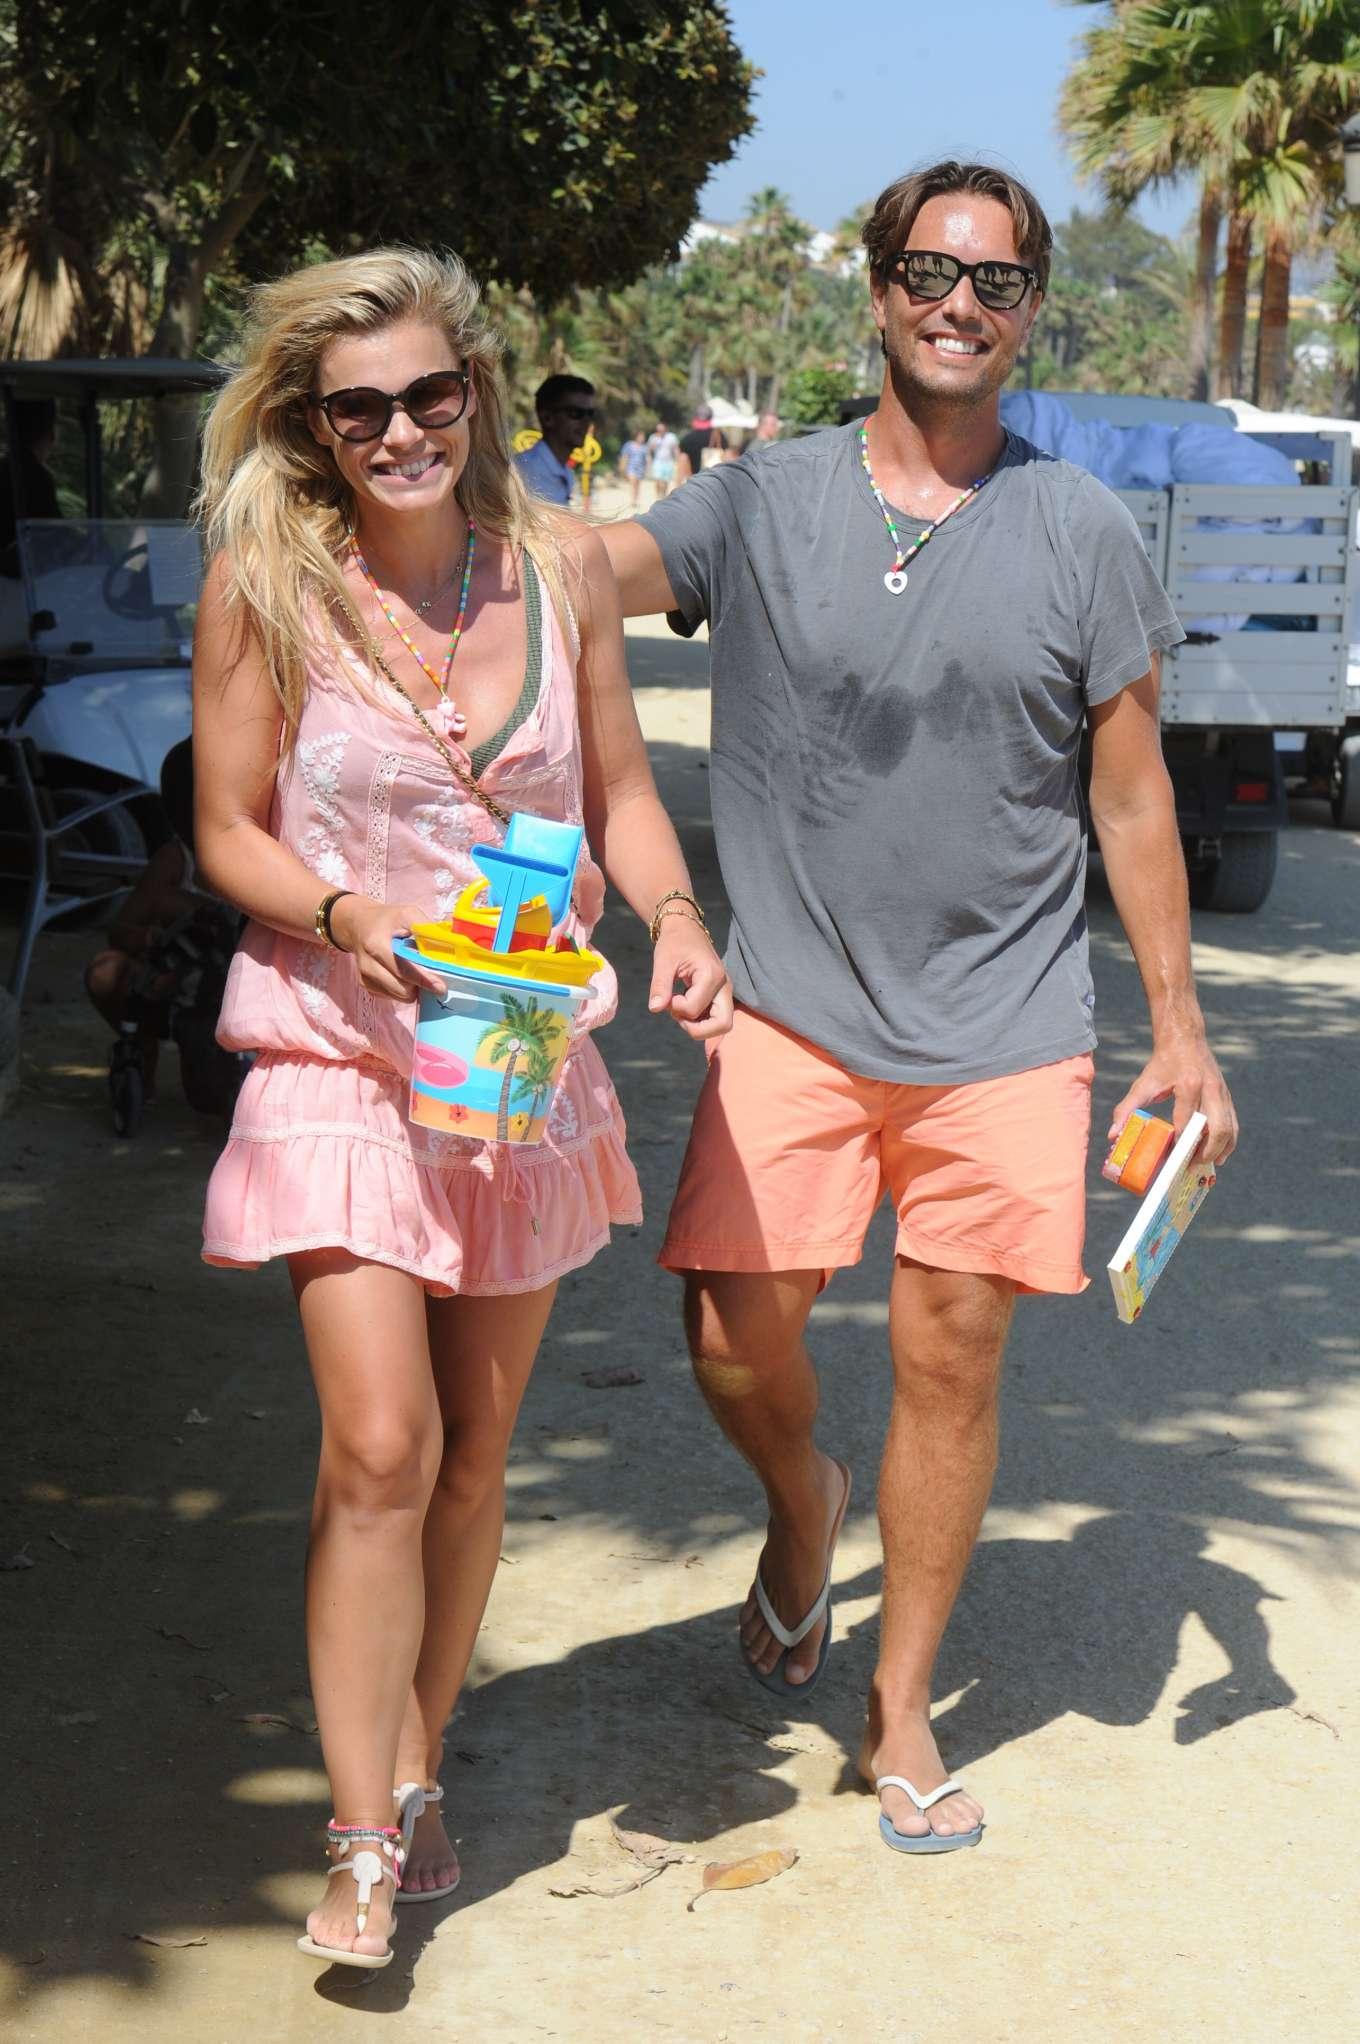 With Dam In Holiday Van Marbella On Husband Bass Nicolette wlPuOZTkiX